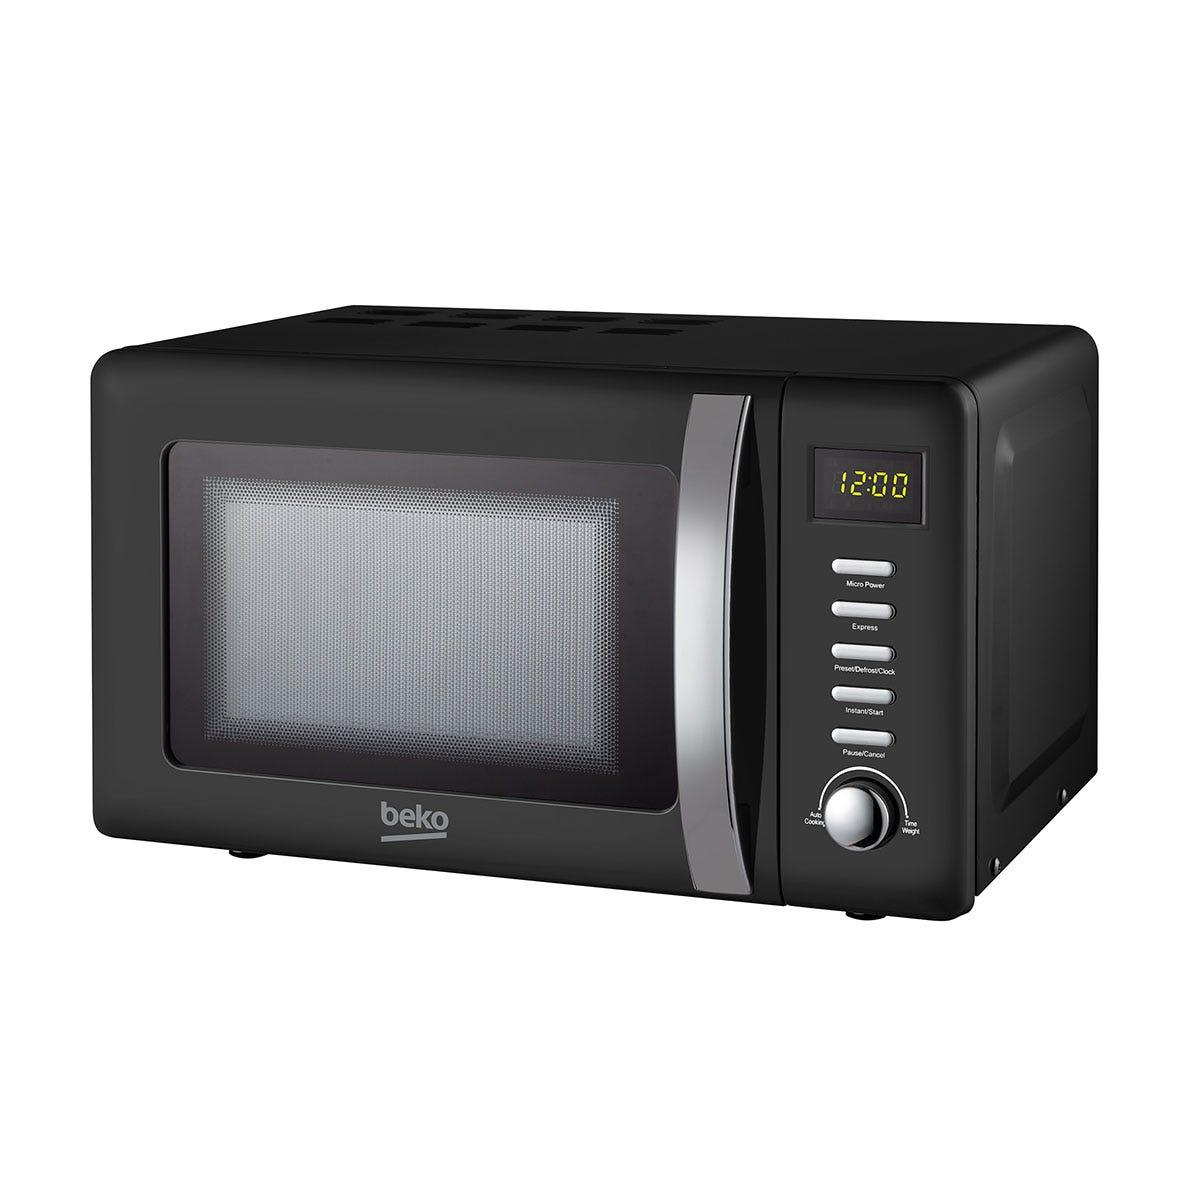 Beko MOC20200B Retro 20L Compact 800W Microwave - Black